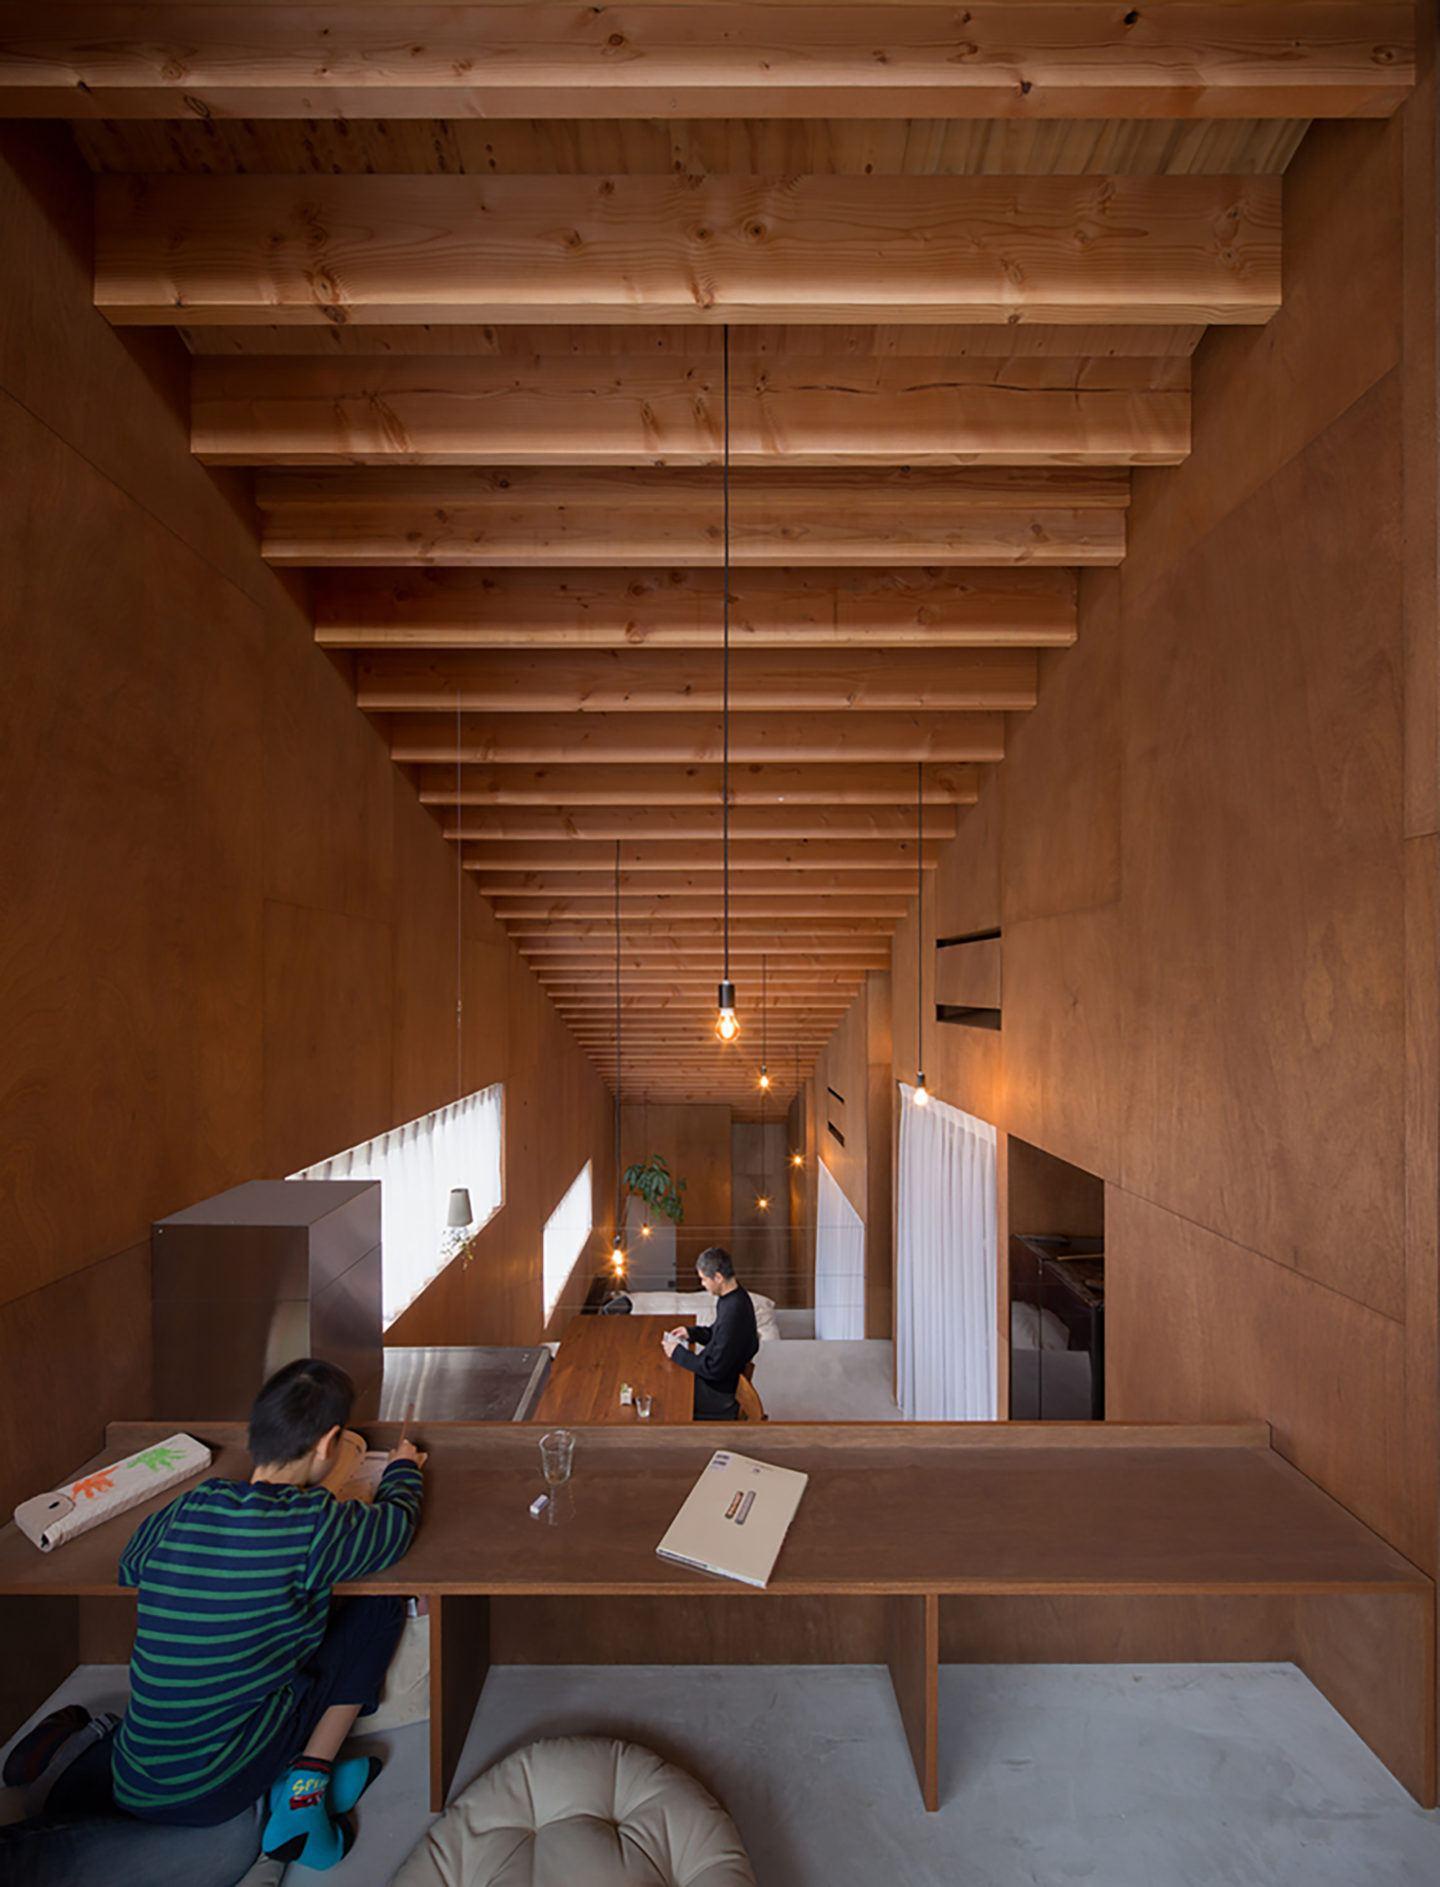 IGNANT-Architecture-Matsuyama-And-Associates-Layer-House-11